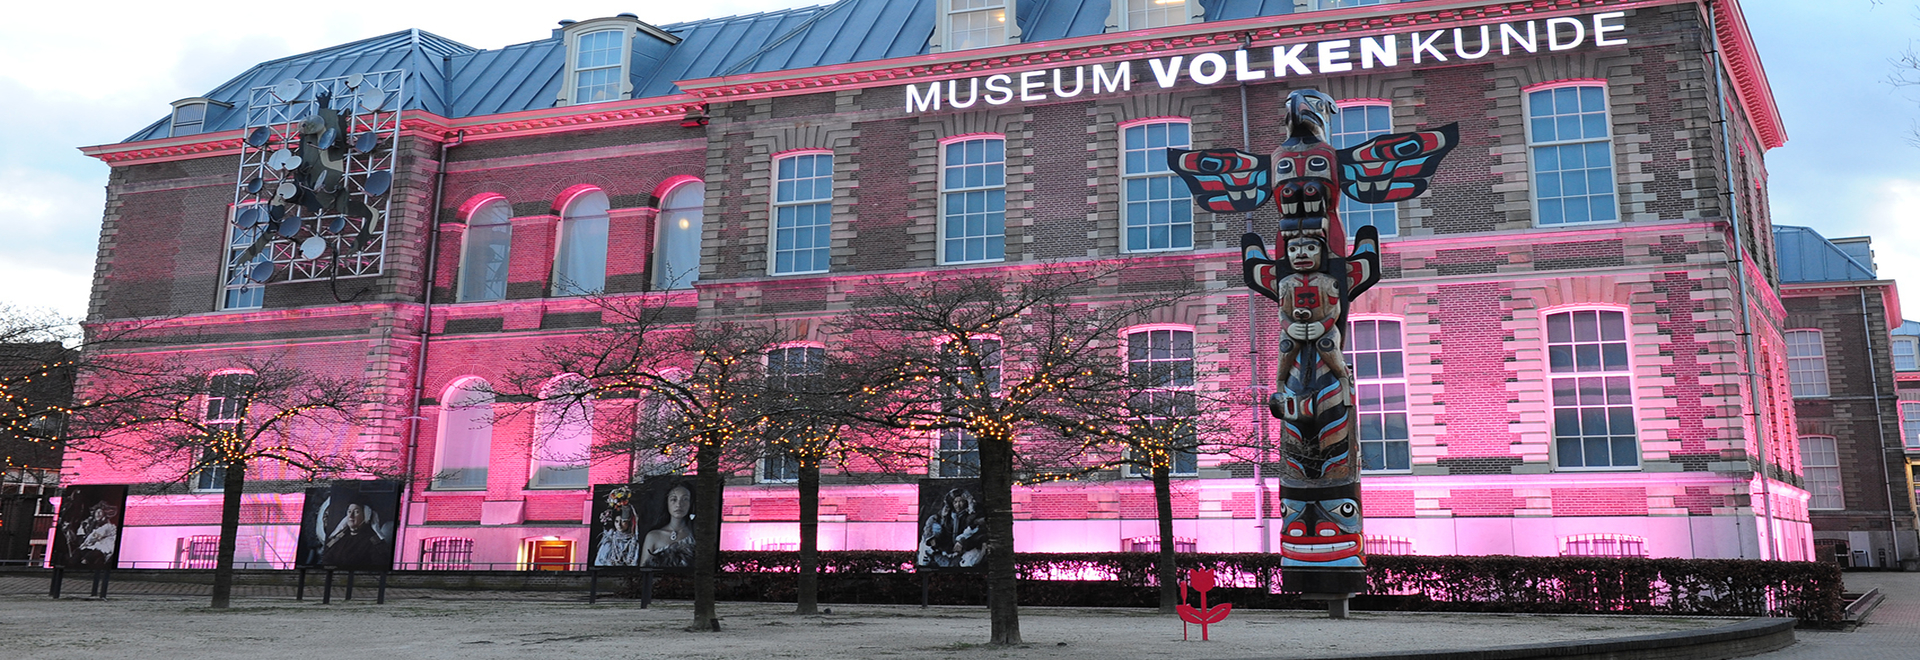 Museum Volkenkunde Leiden the Netherlands